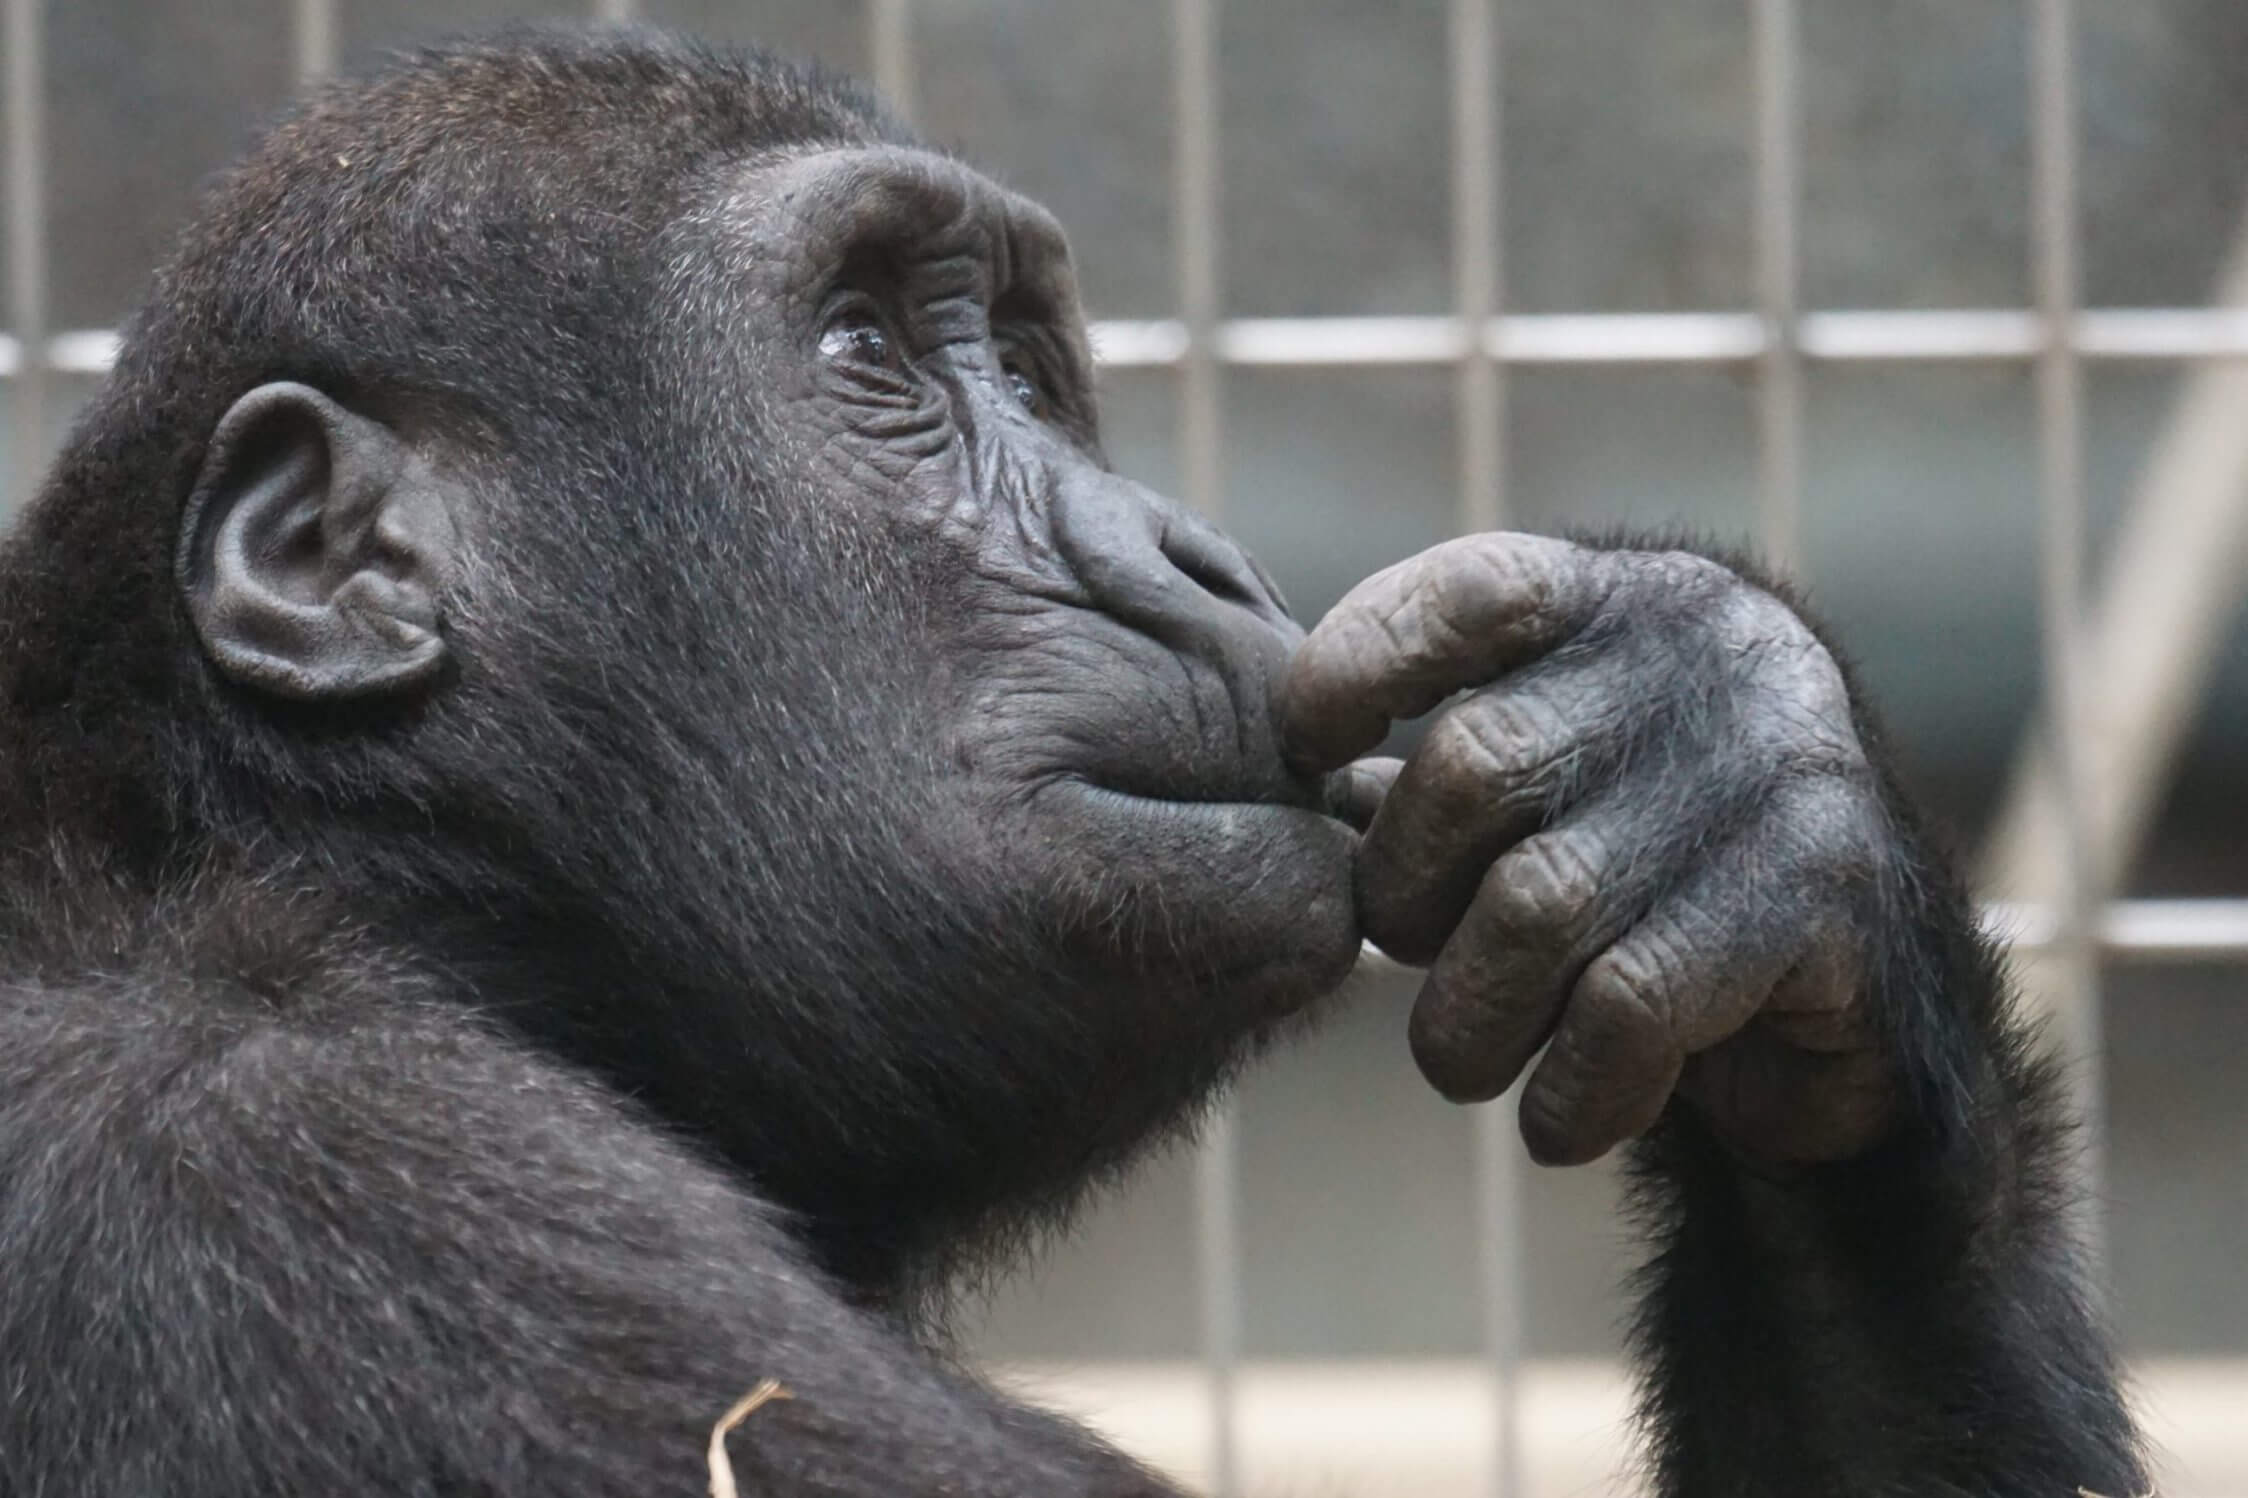 primate ape thinking mimic - Blog